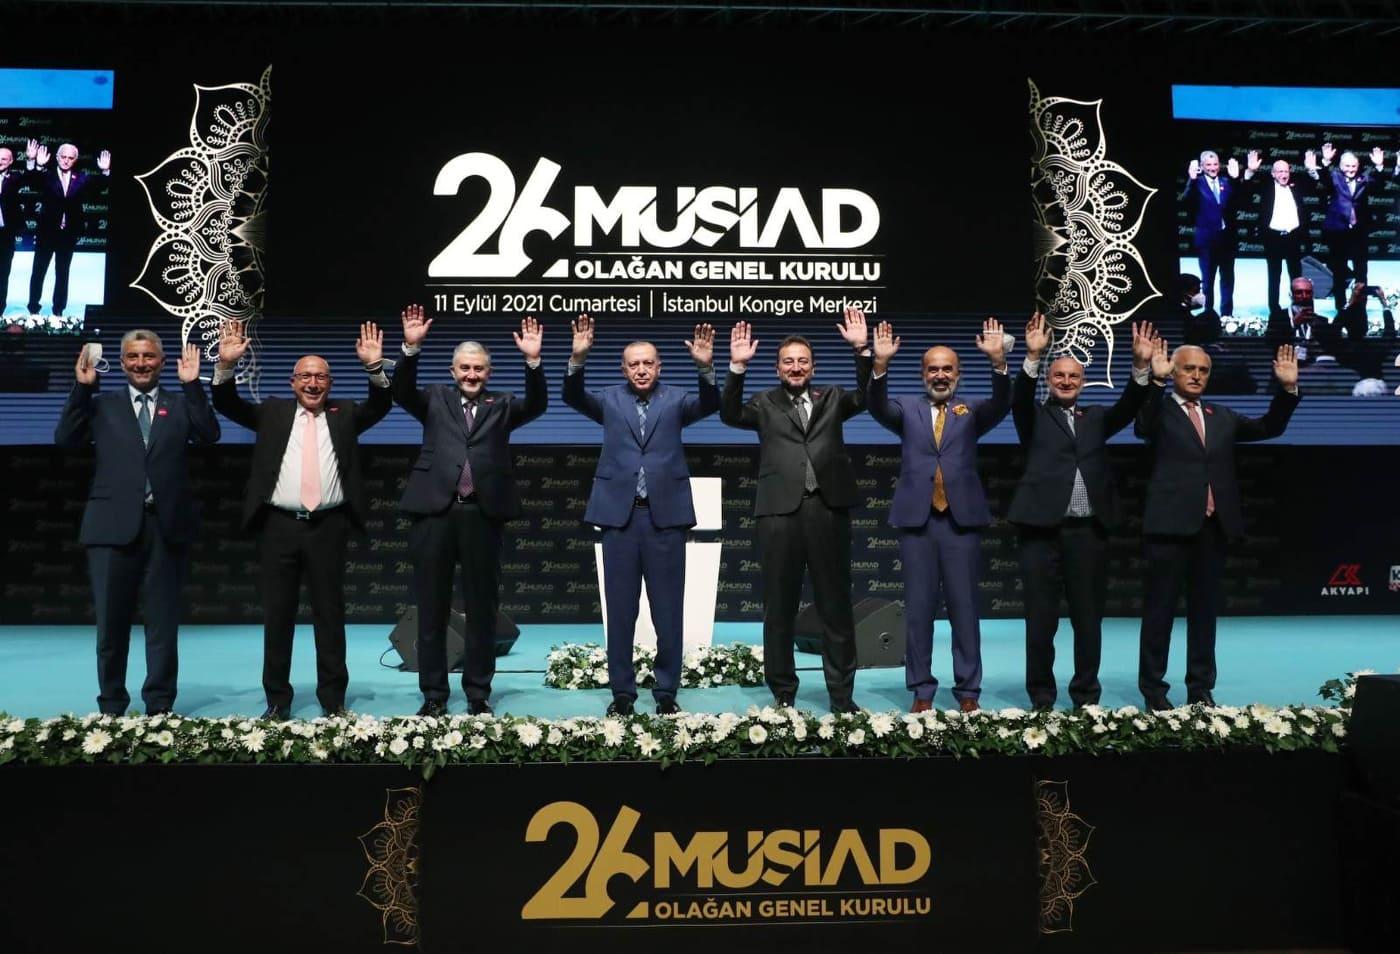 MÜSİAD'IN YENİ GENEL BAŞKANI BELLİ OLDU...